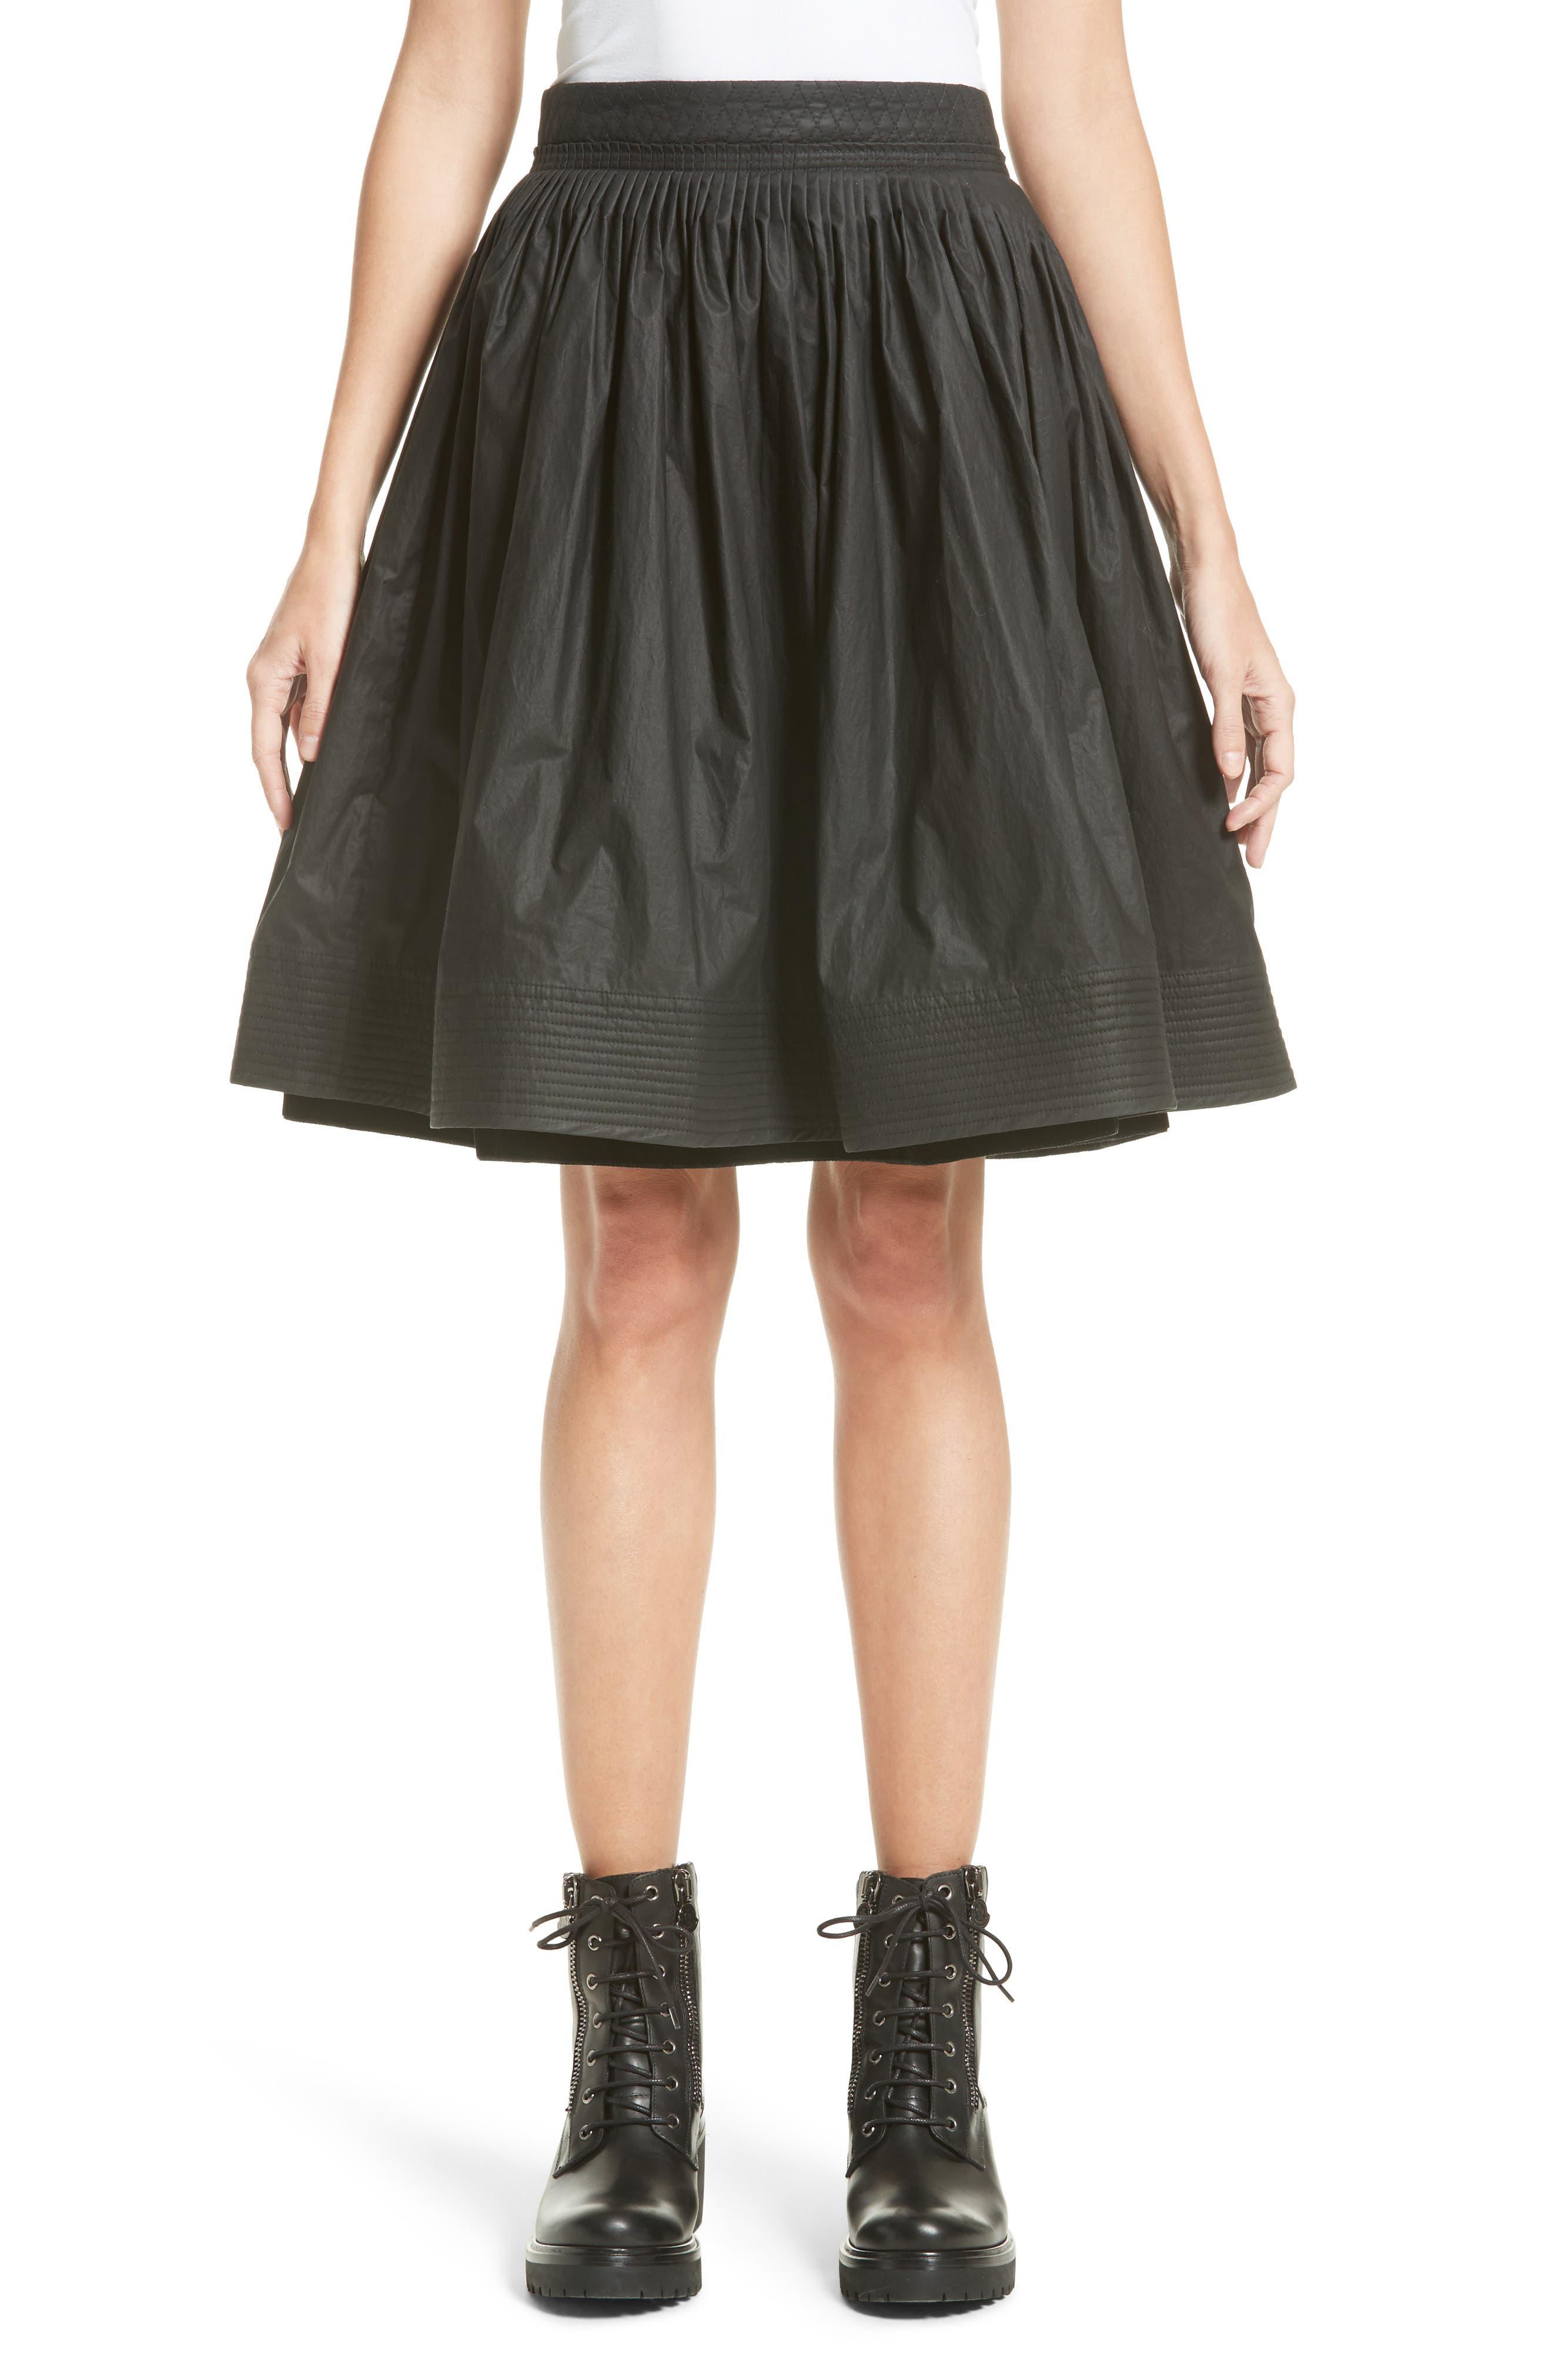 Alternate Image 1 Selected - Moncler Gonna Cotton A-Line Skirt